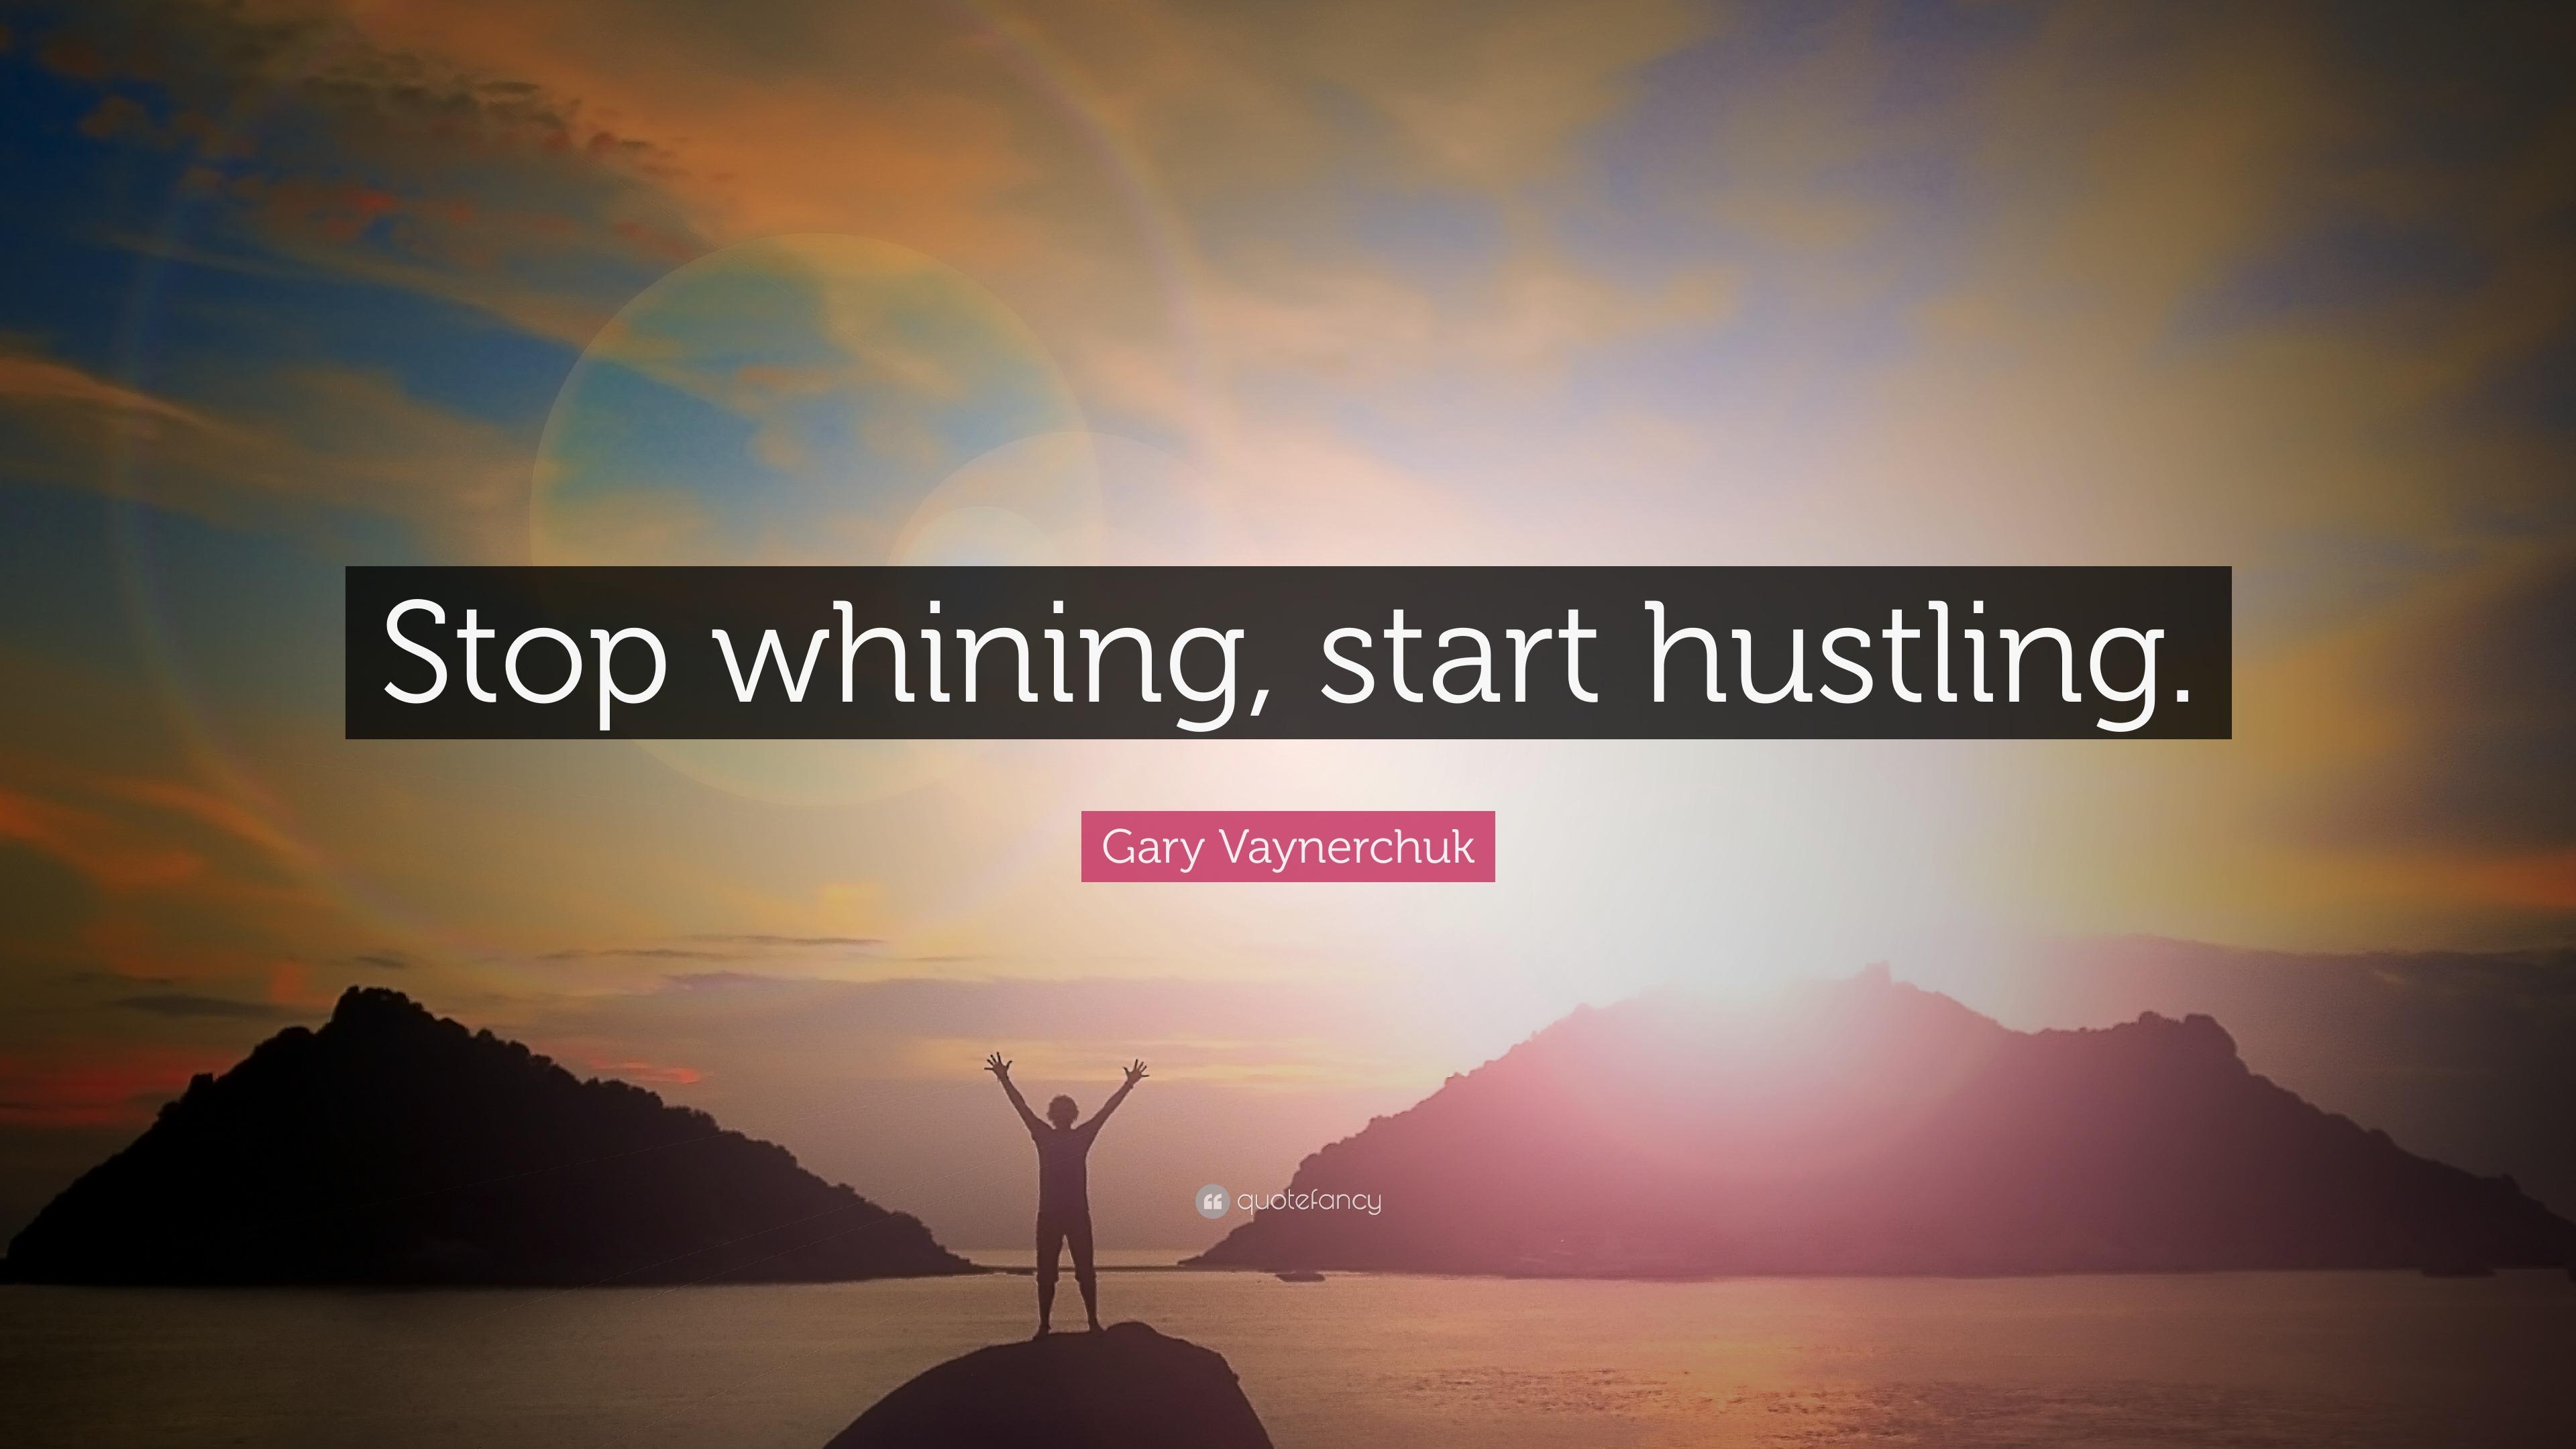 Stop whining, start hustling